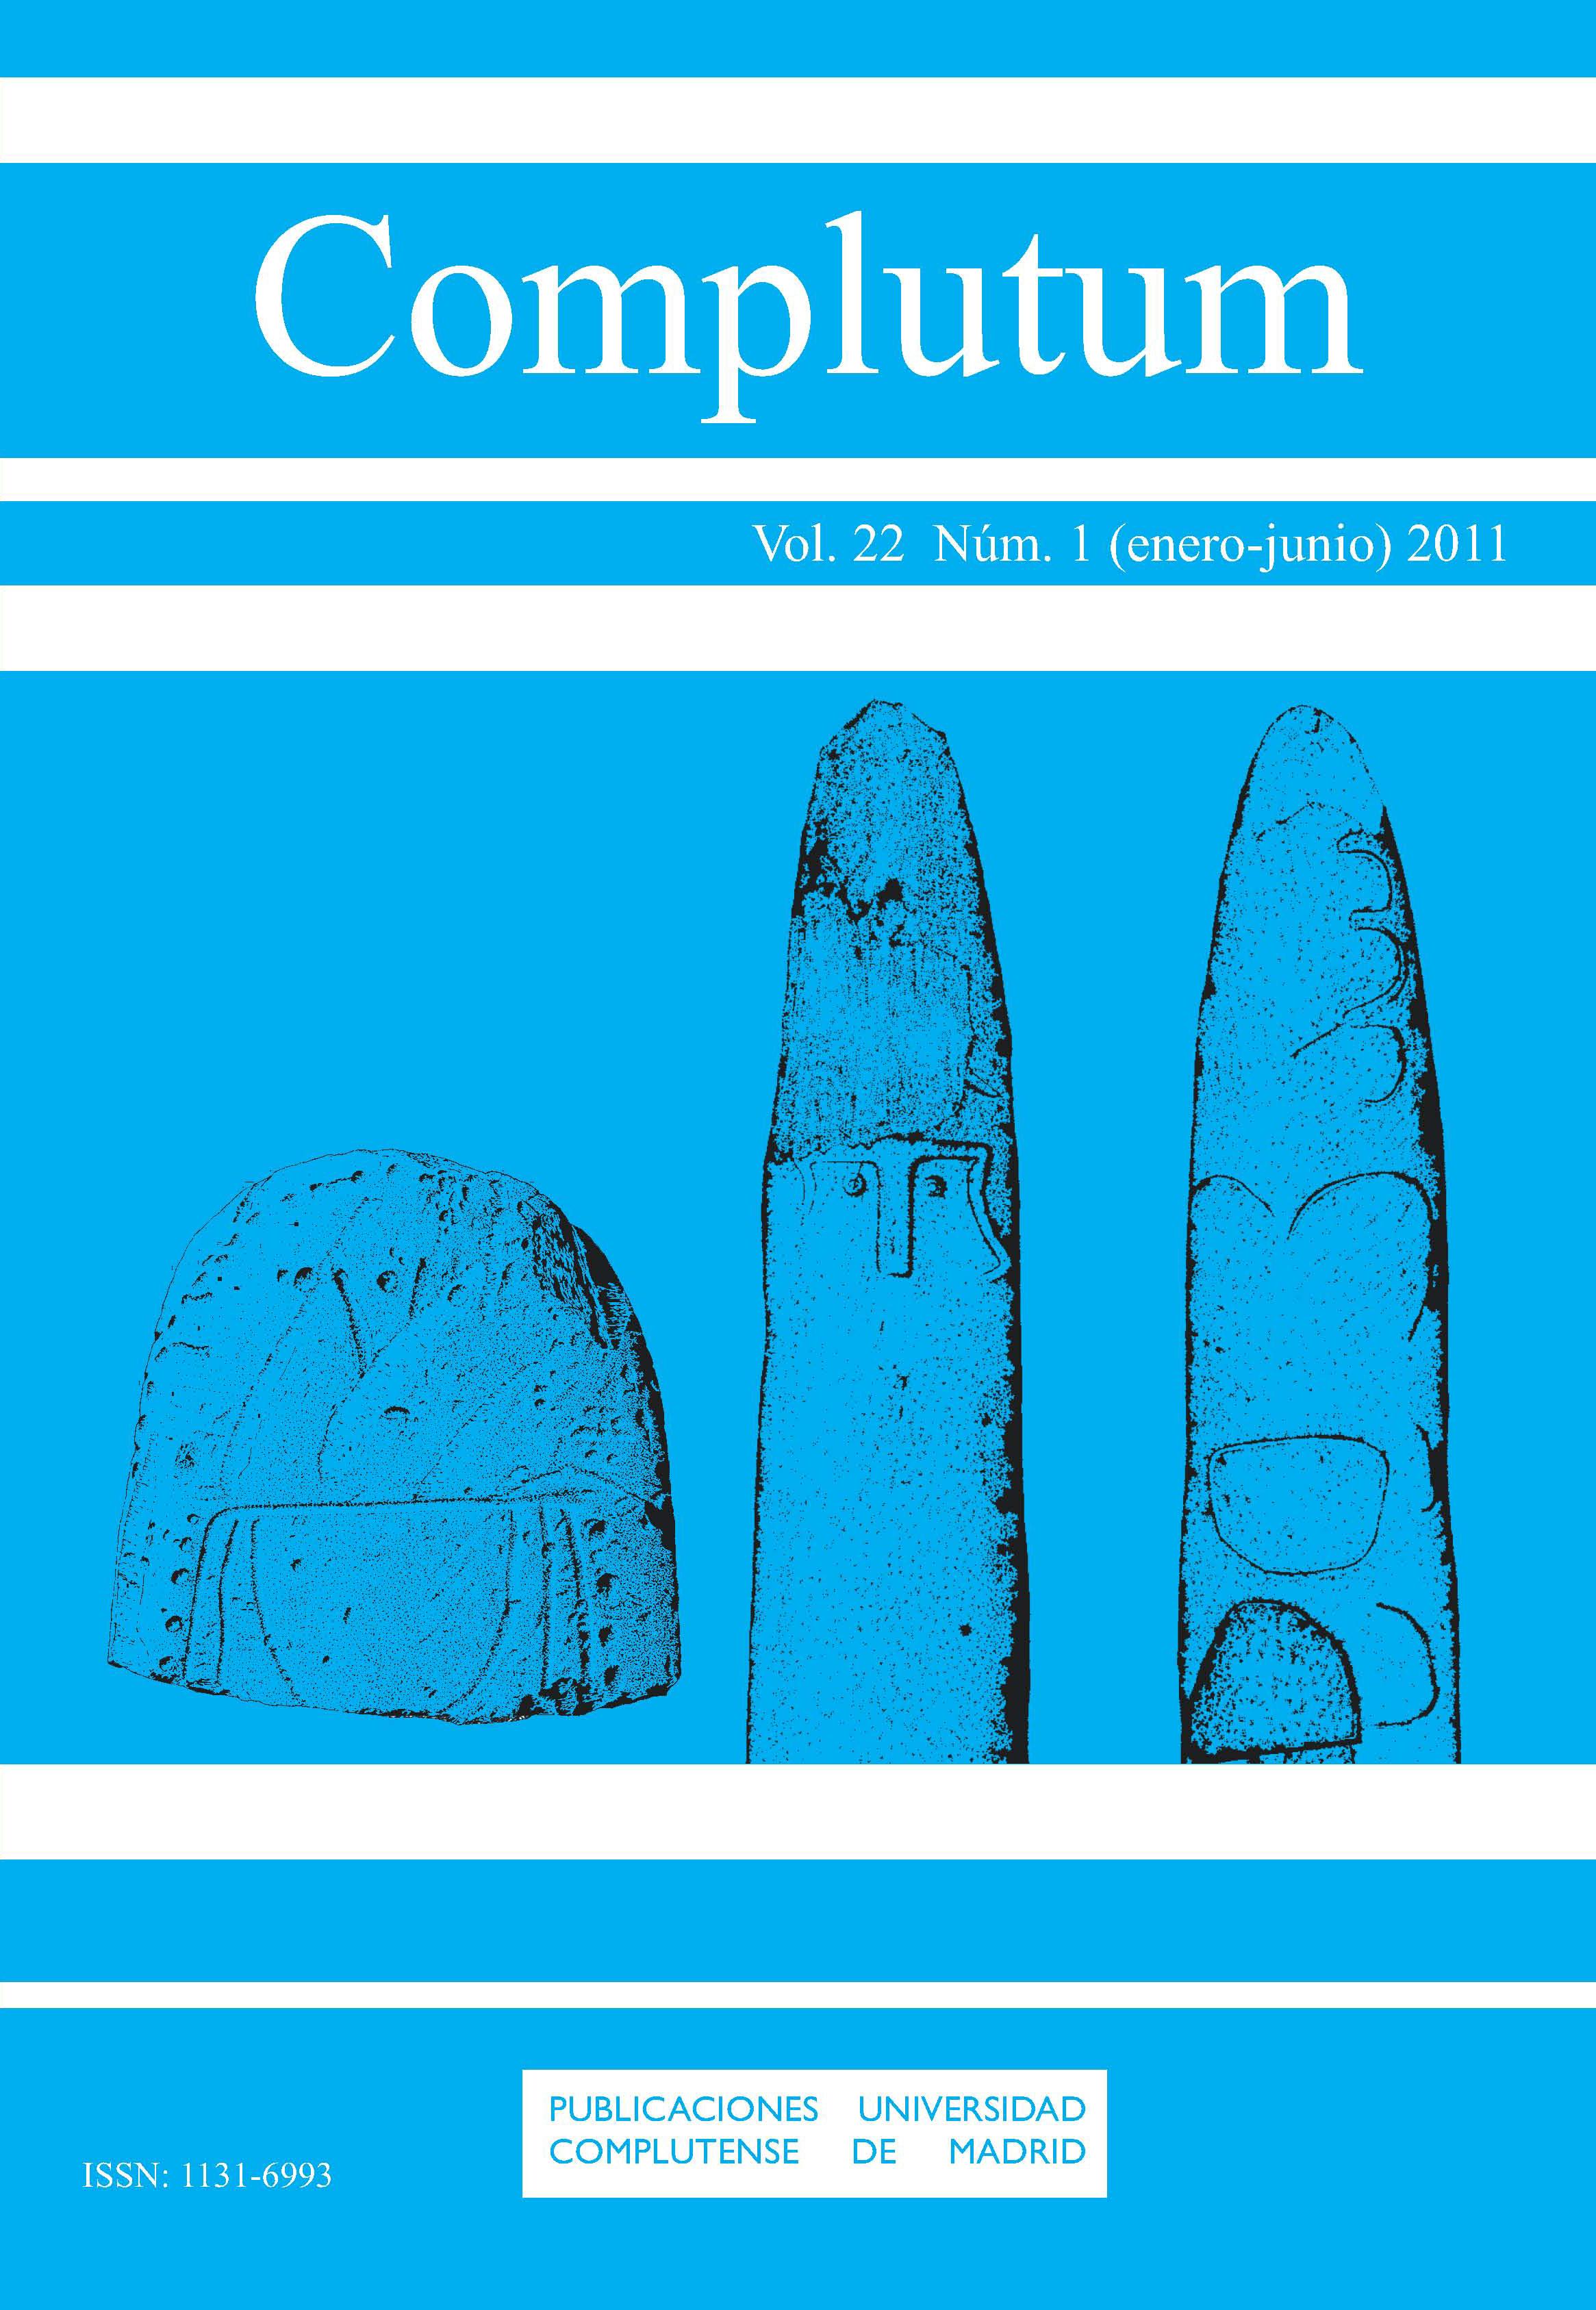 Complutum Vol. 22, Núm. 1